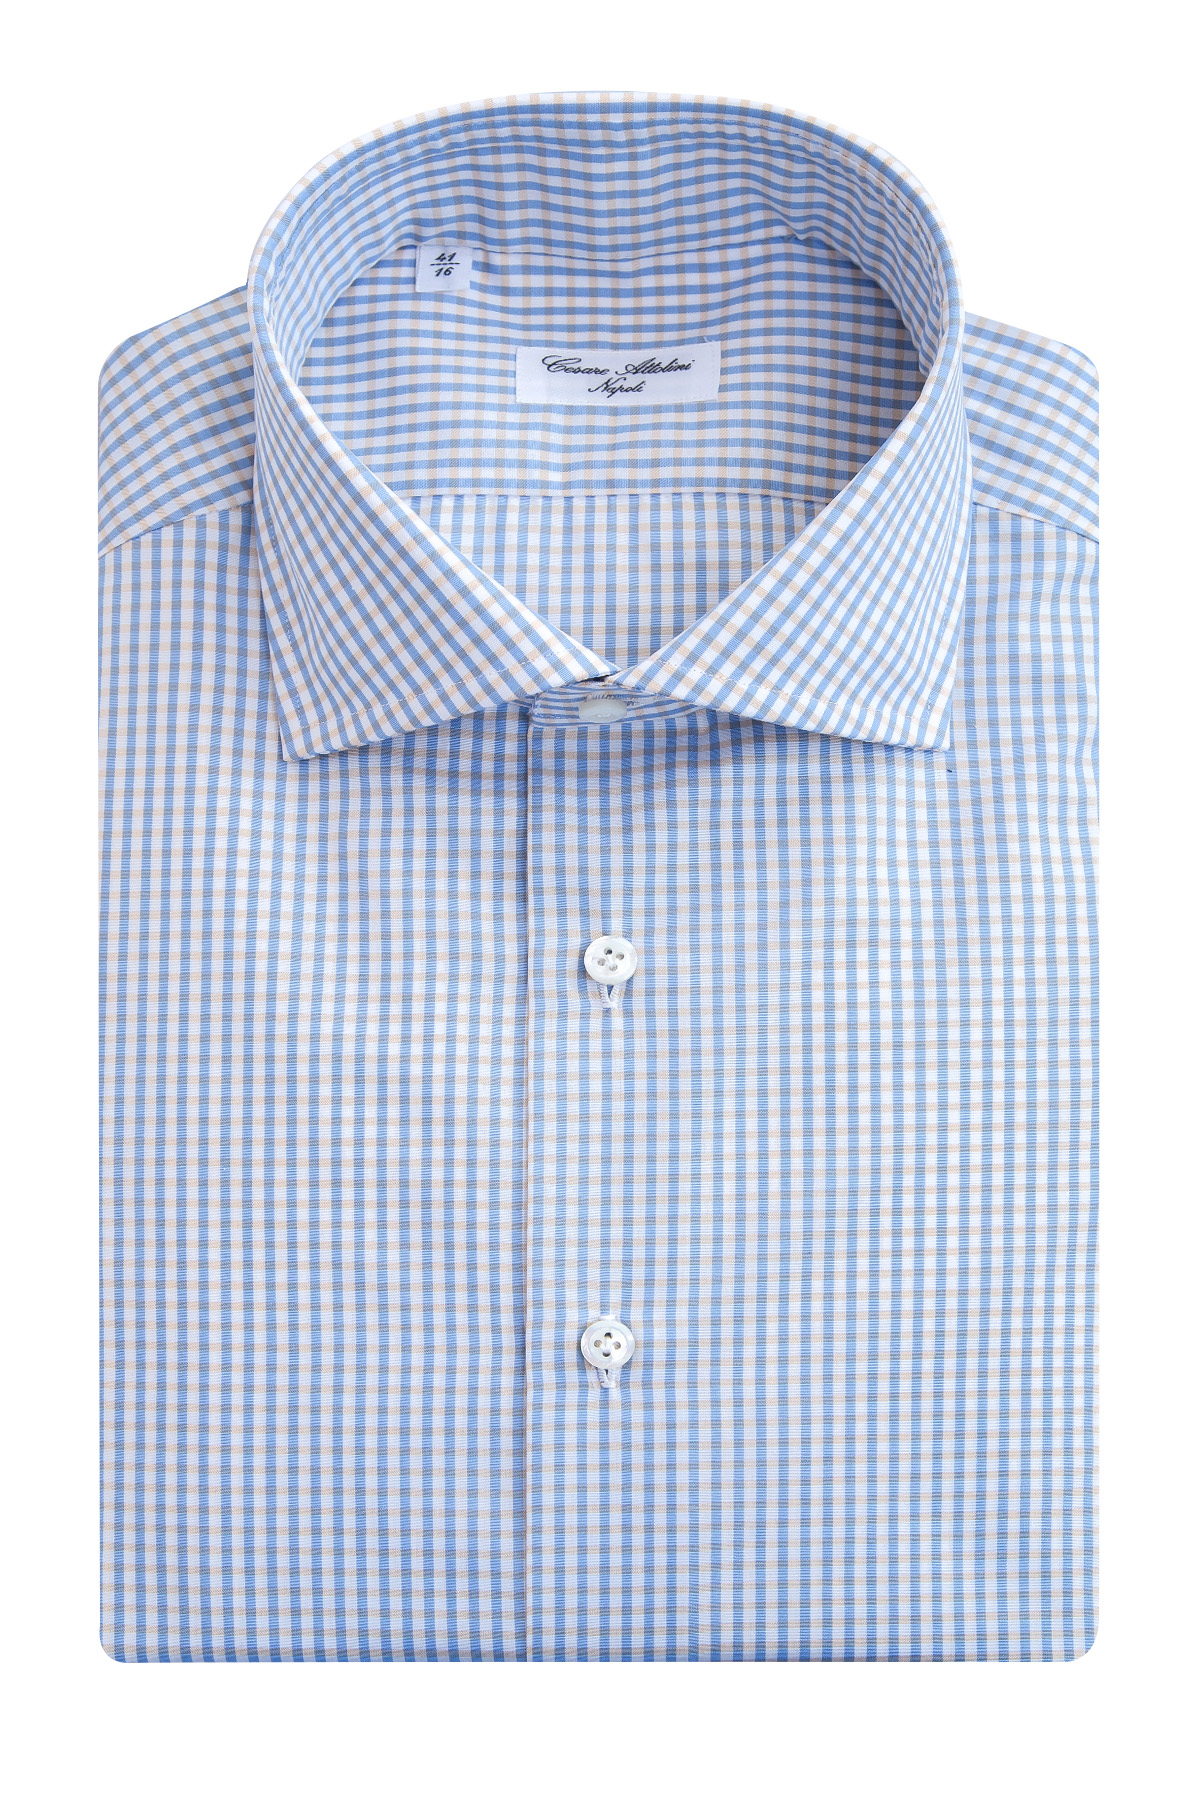 Купить Рубашка, CESARE ATTOLINI, Италия, хлопок 100%